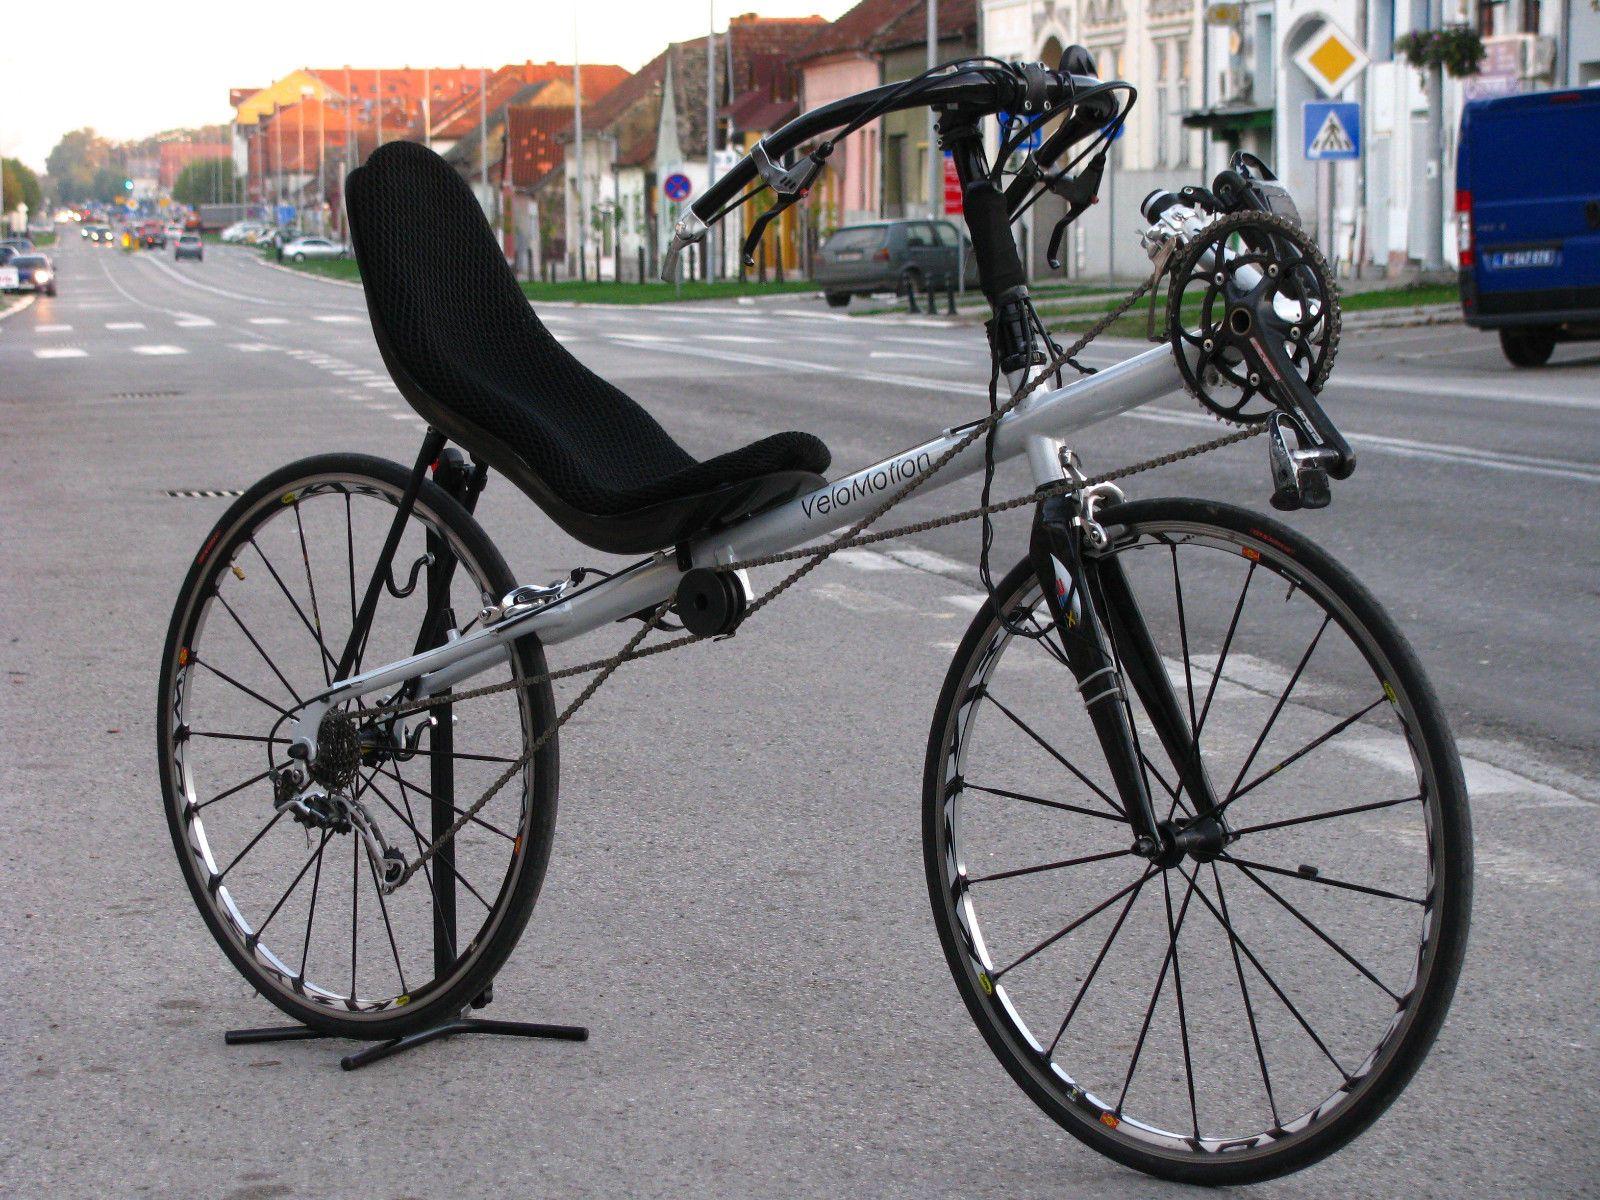 Velomotion Scopa Brand New Recumbent Bicycle Frame Set Kit Road Audax Gravel Recumbent Bicycle Bicycle Frame Recumbent Bike Workout